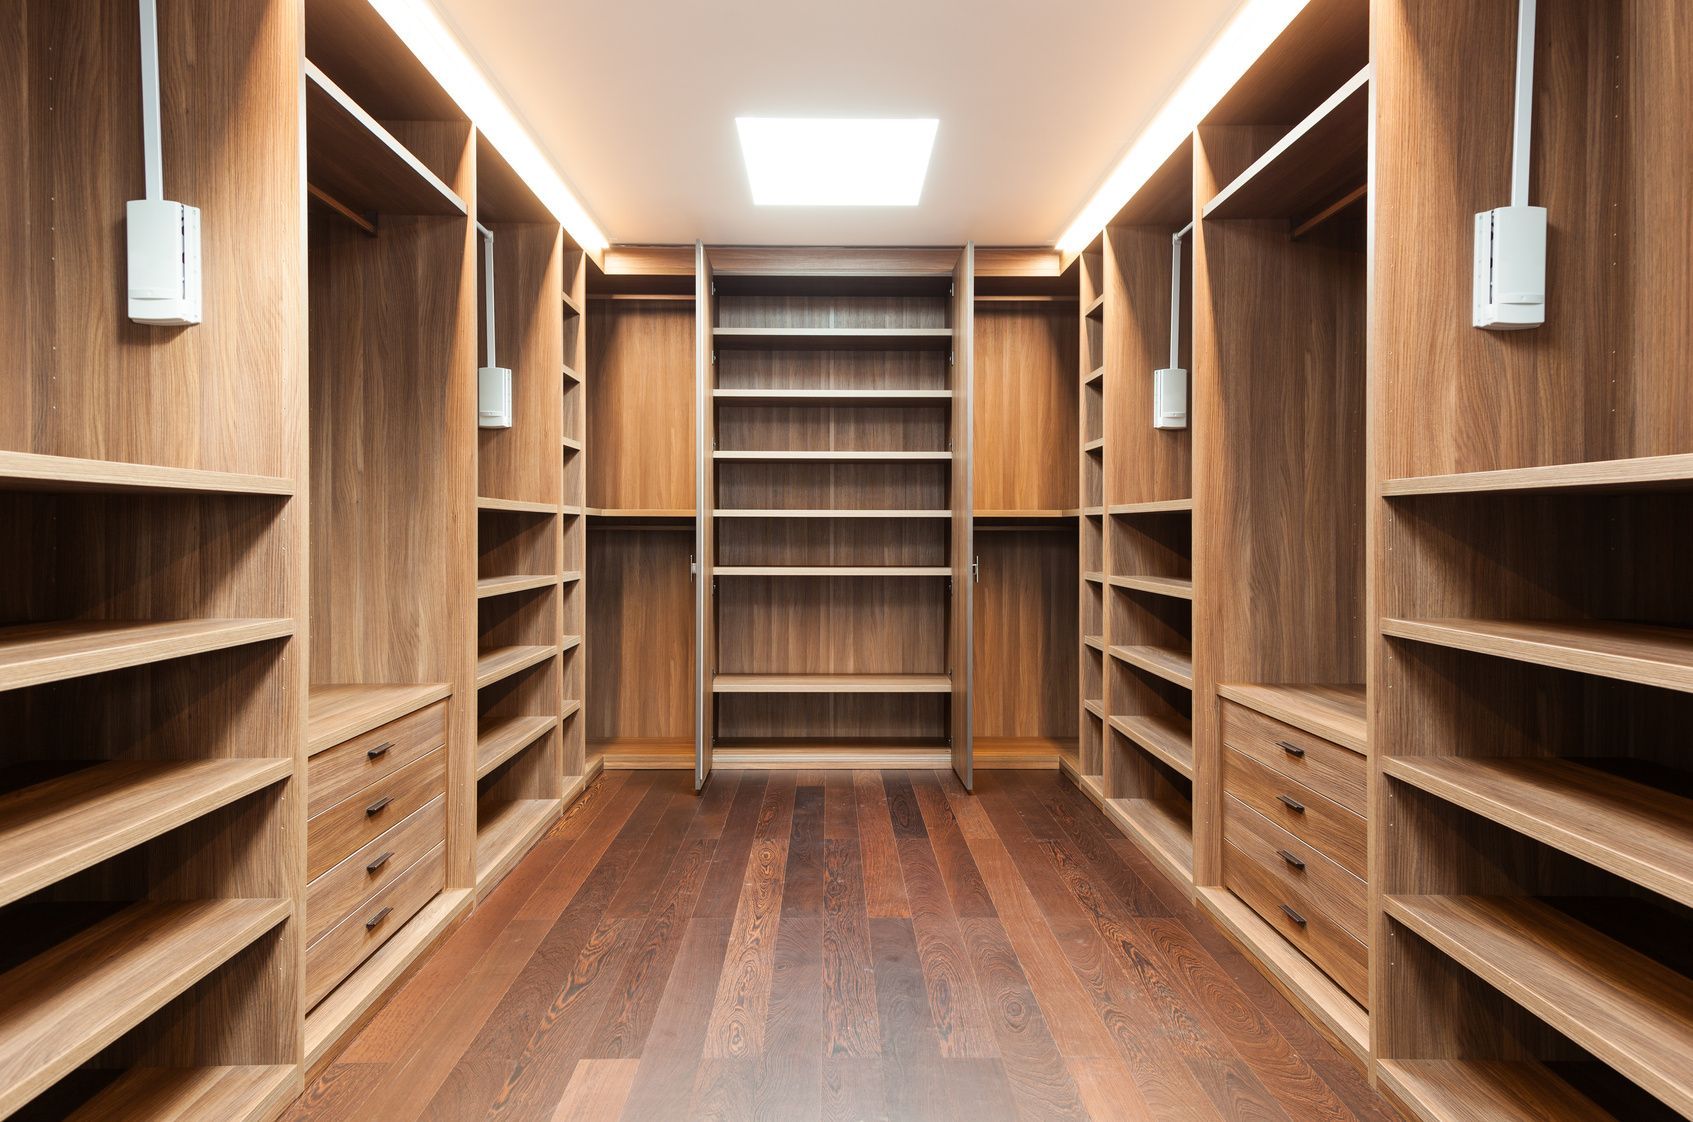 Pin By Babeth Vertucio On Closet Master Bedroom Closet